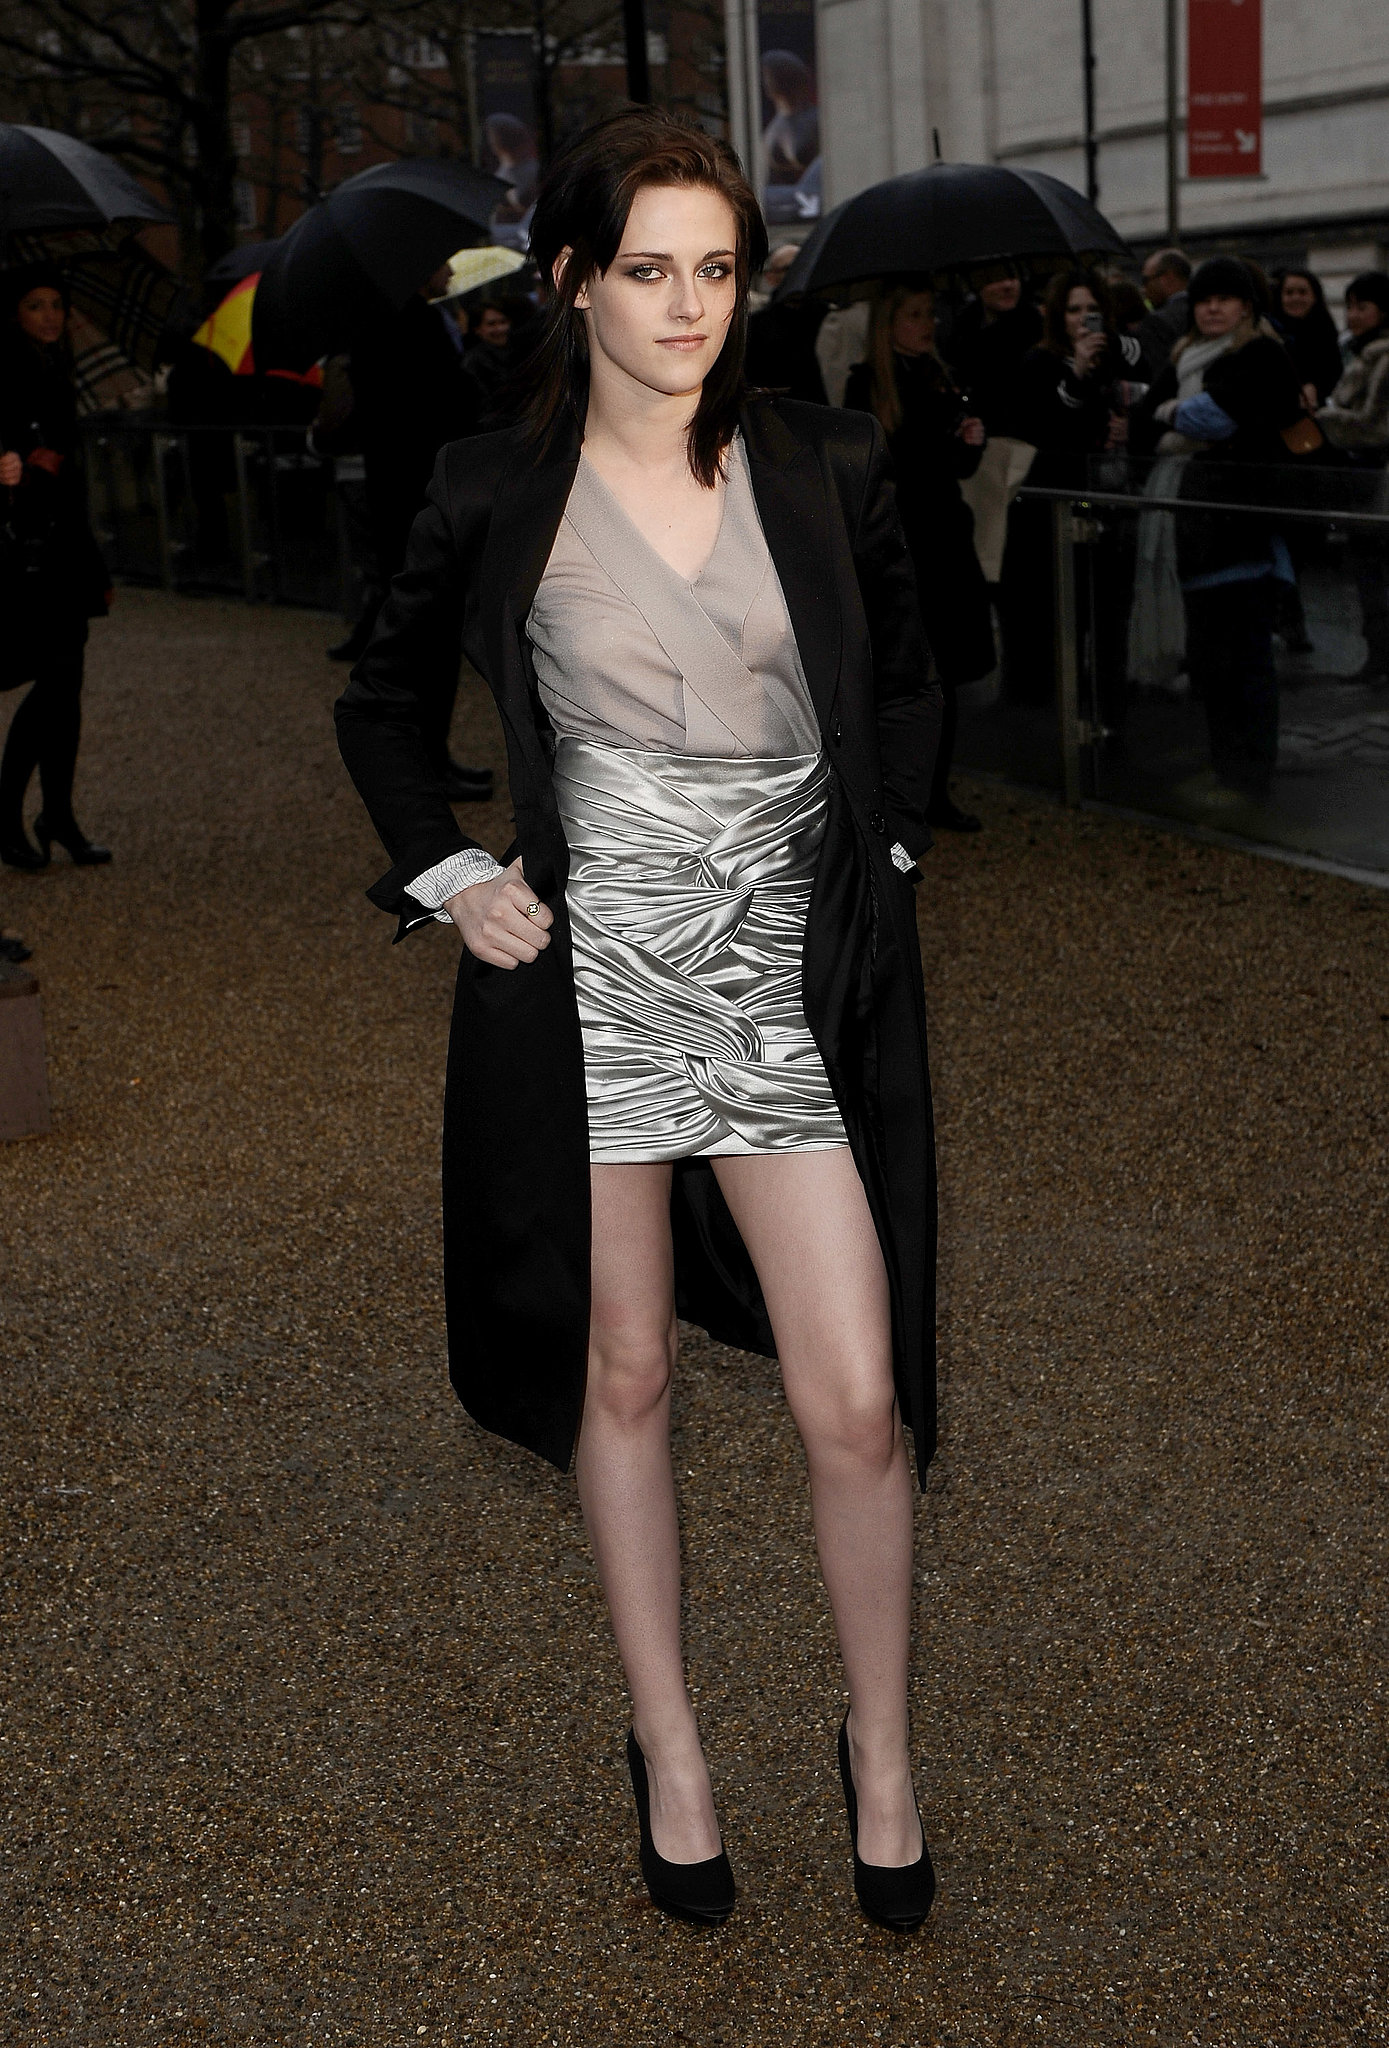 During London Fashion Week Autumn/Winter 2010, Stewart made a statement in a metallic silver Burberry miniskirt.